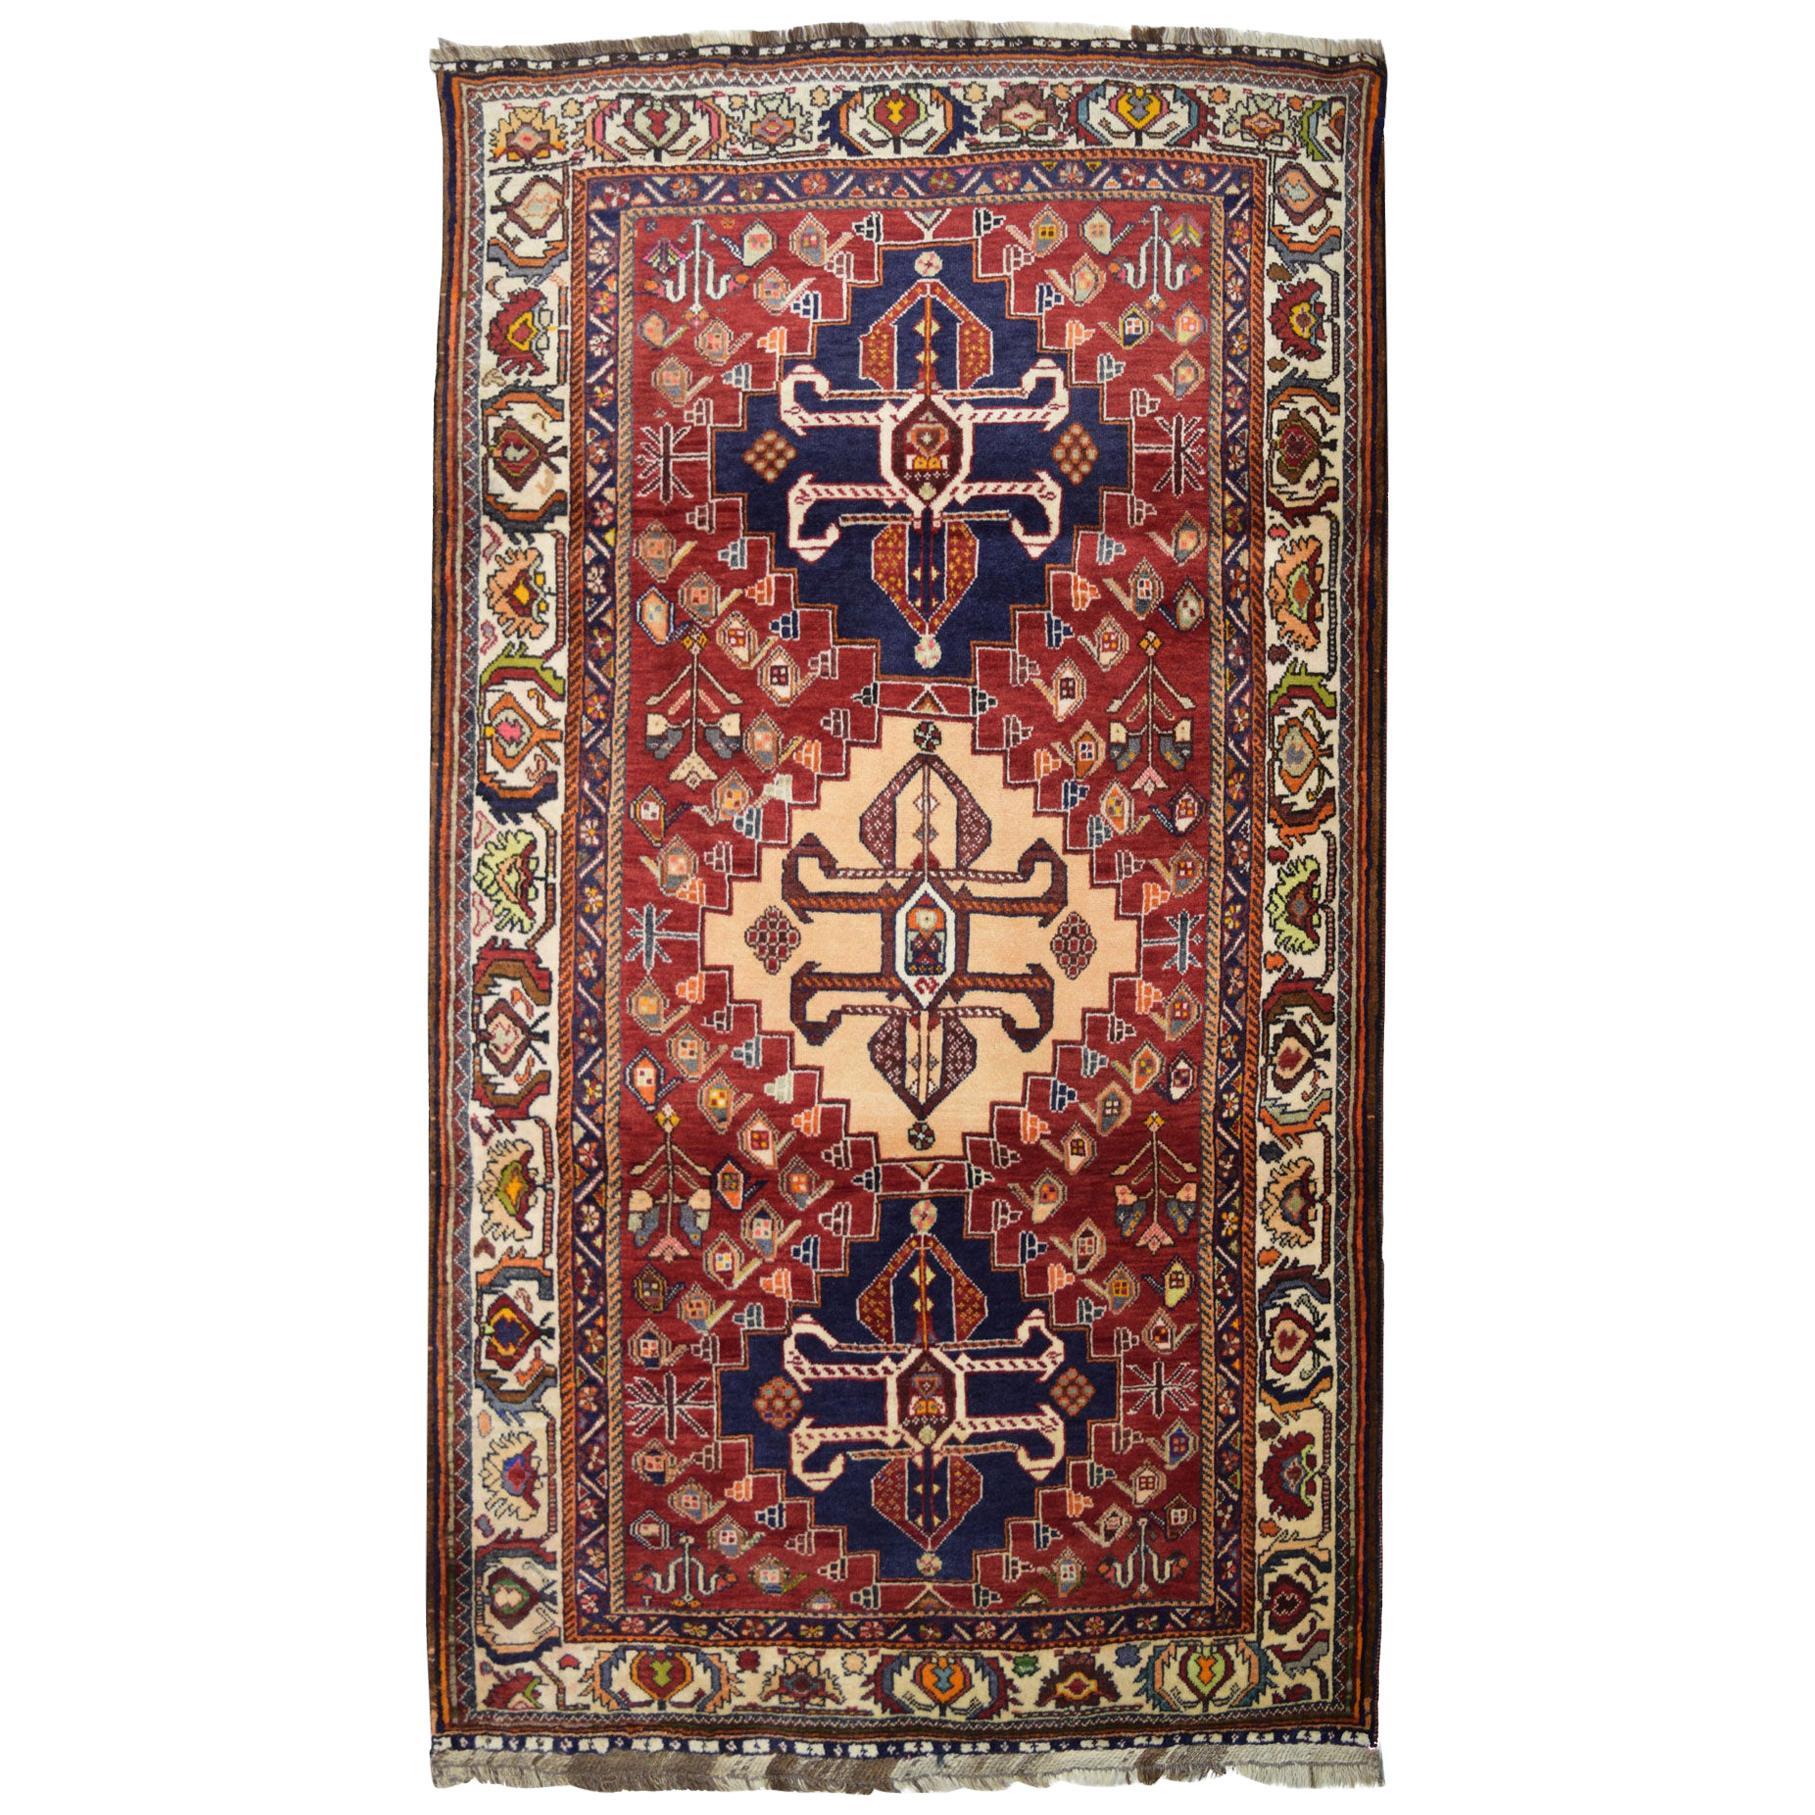 Transitional Red, Blue, and Cream Persian Kashkooli Wool Carpet